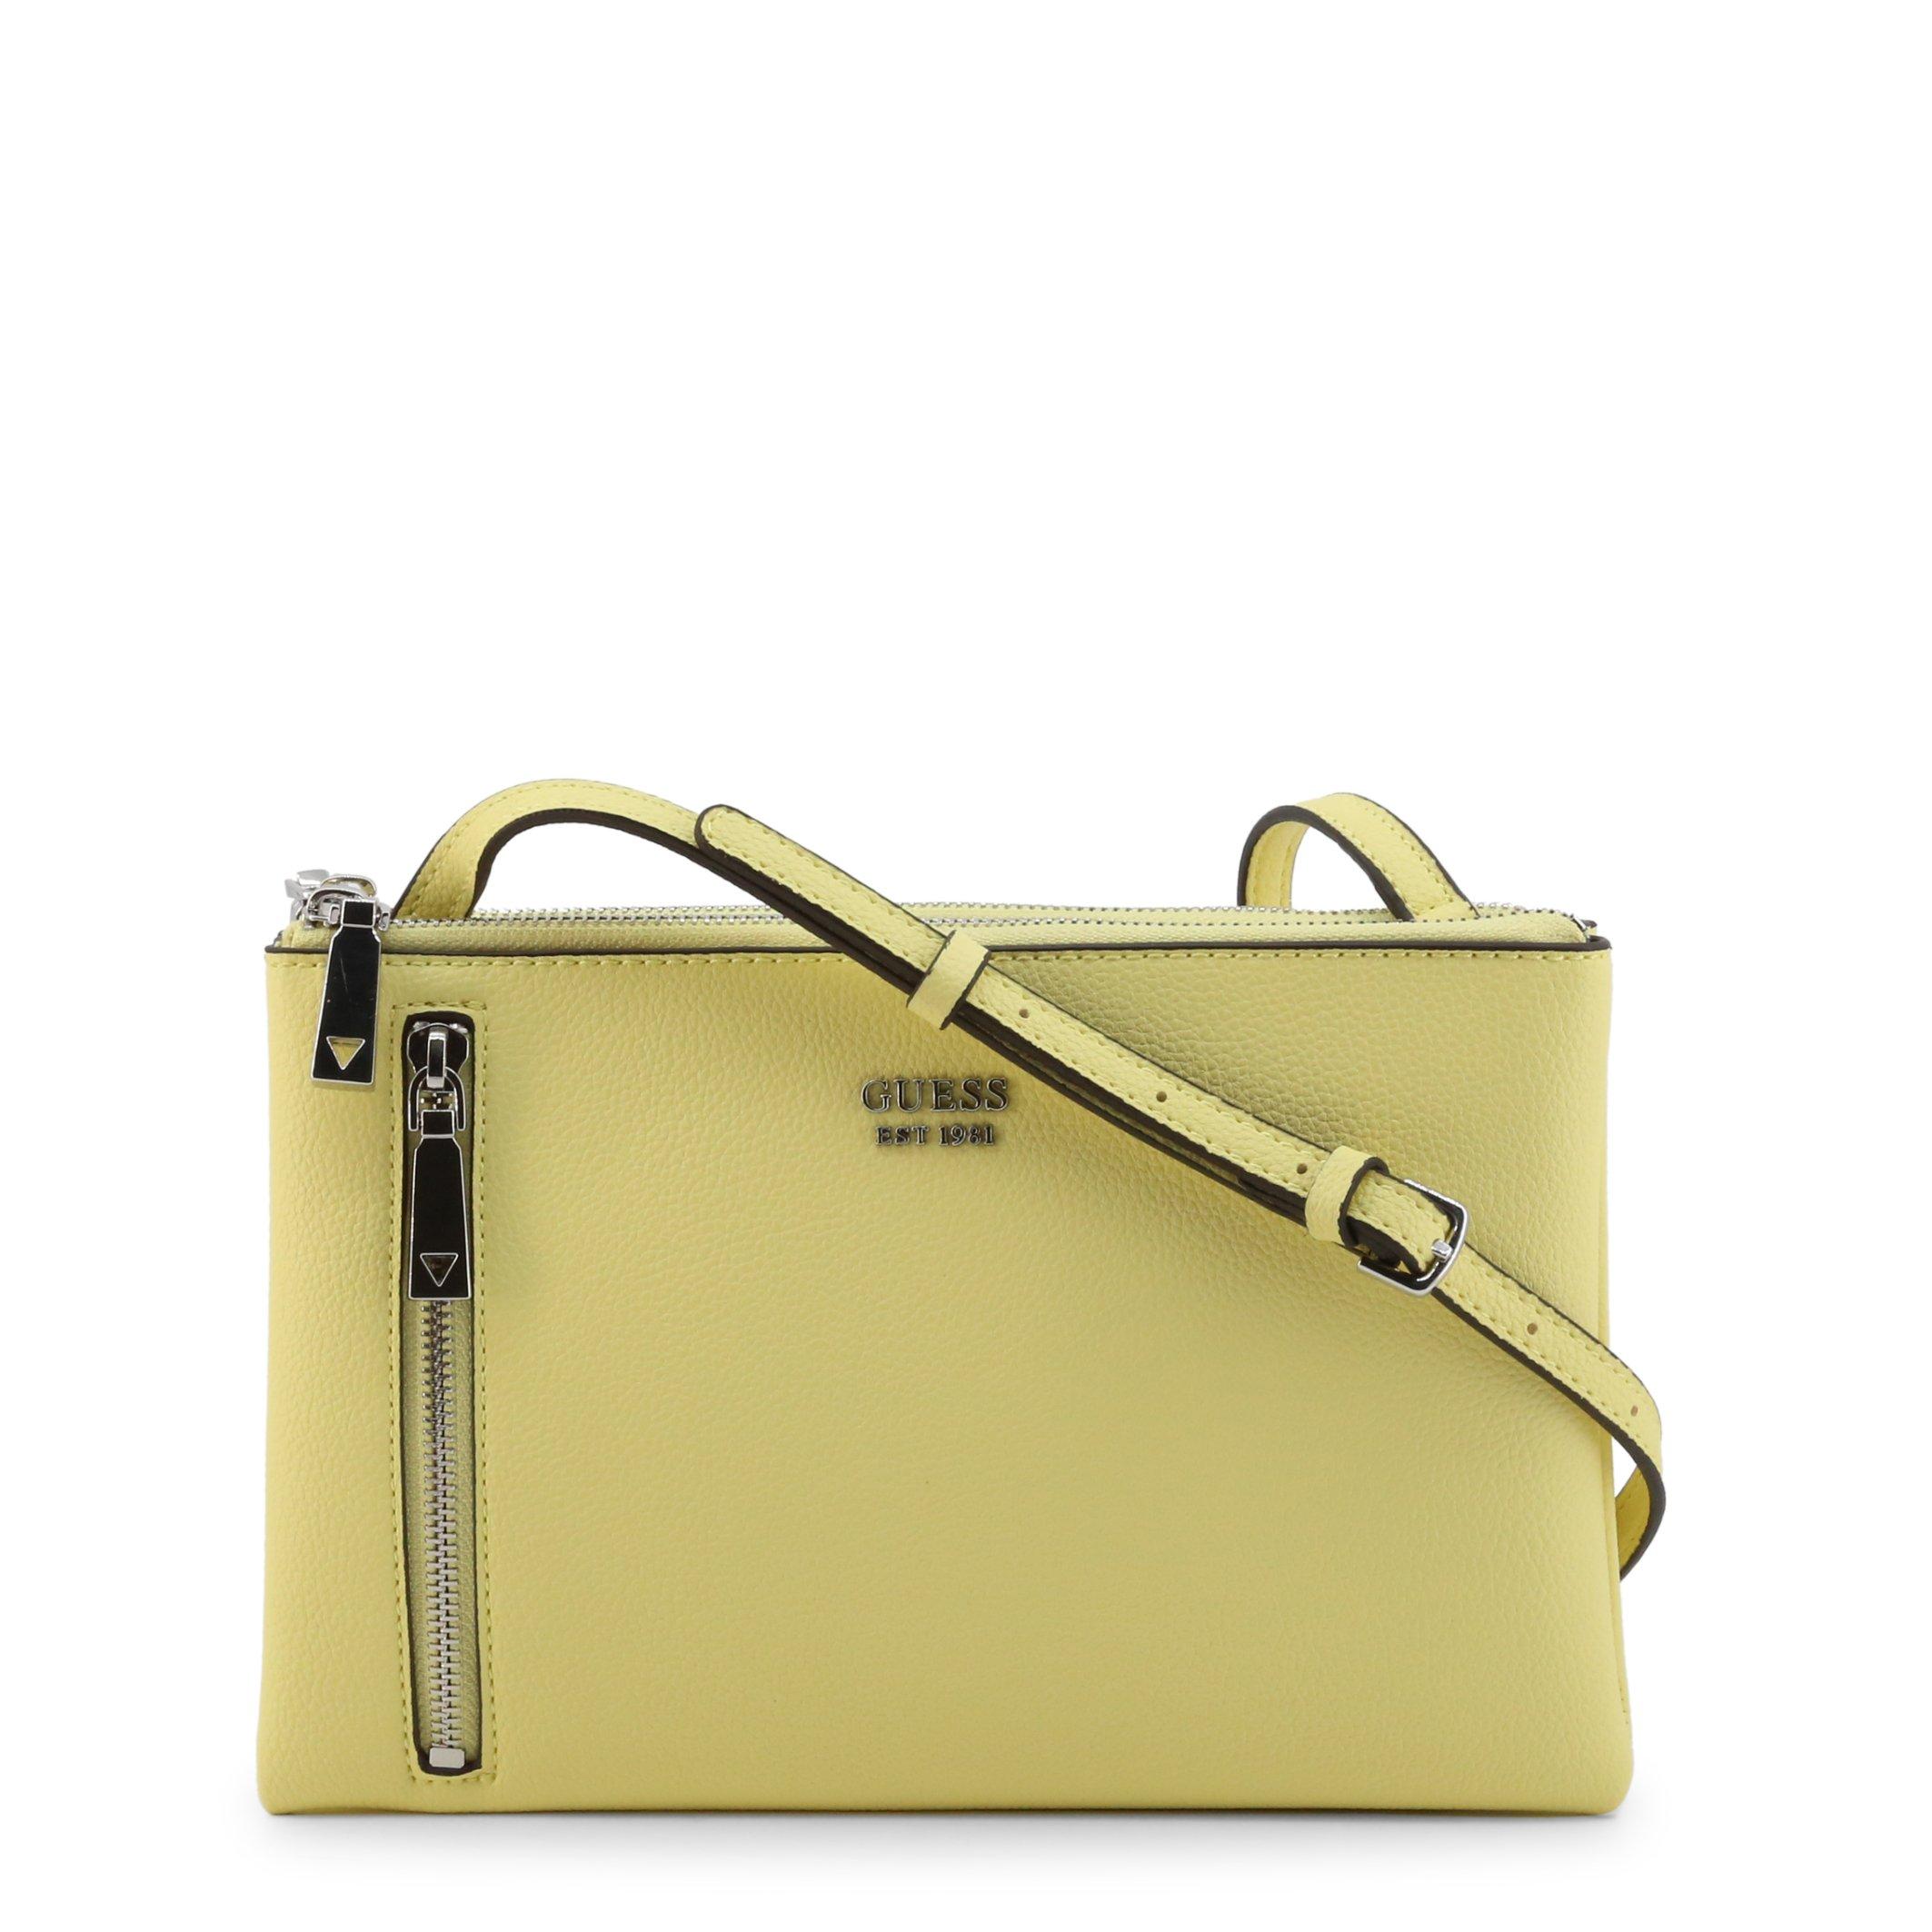 Guess Women's Crossbody Bag Various Colours Naya_HWVY78_81700 - yellow NOSIZE